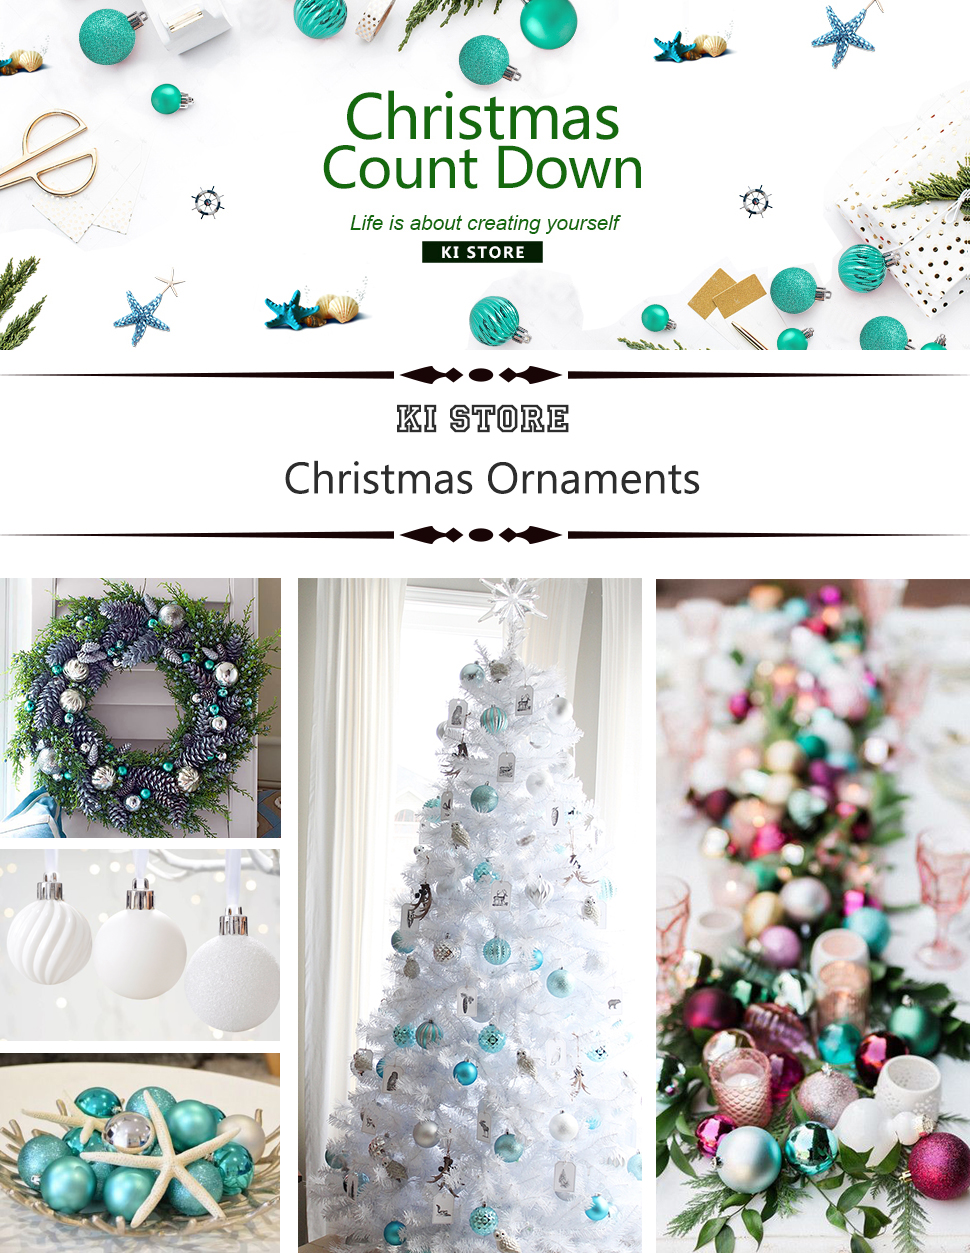 Amazon.com: KI Store 34ct Christmas Ball Ornaments Shatterproof ...